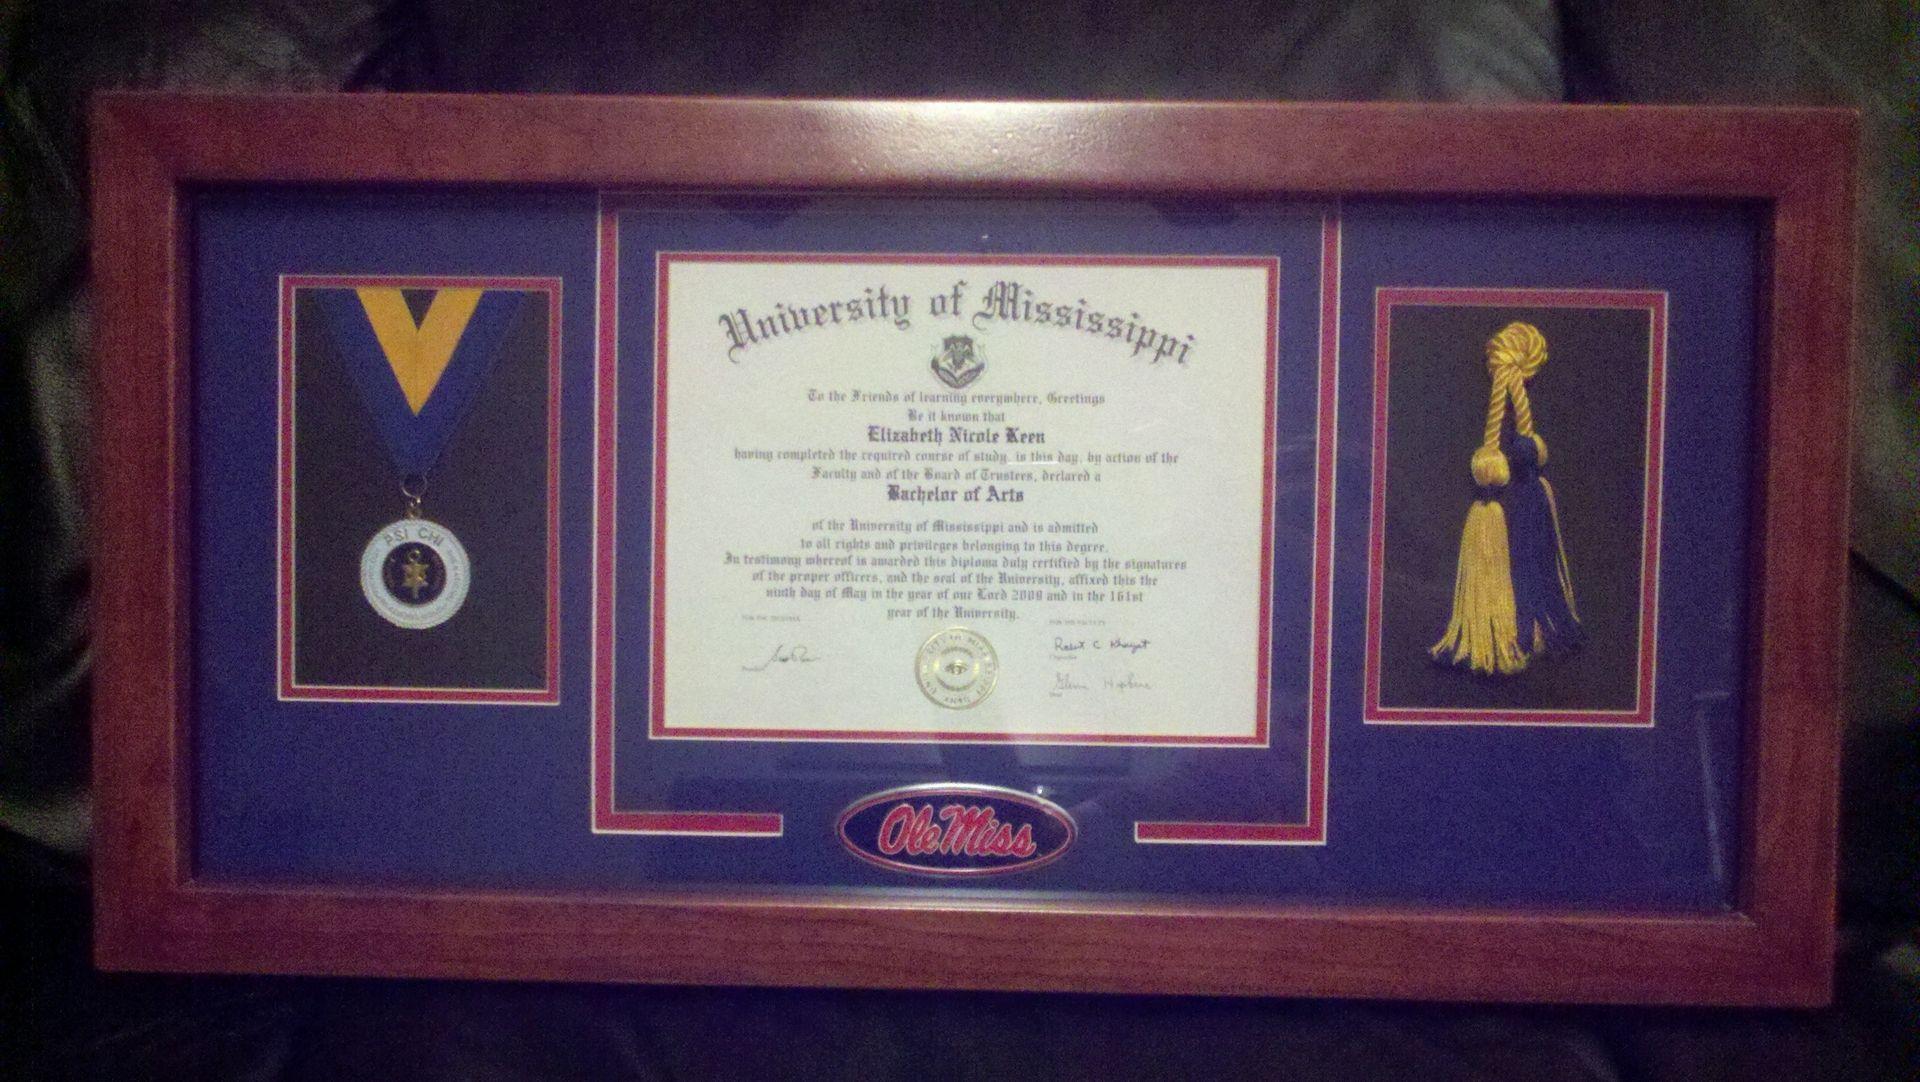 Hand Made Framed Diploma Display Case By Paladin